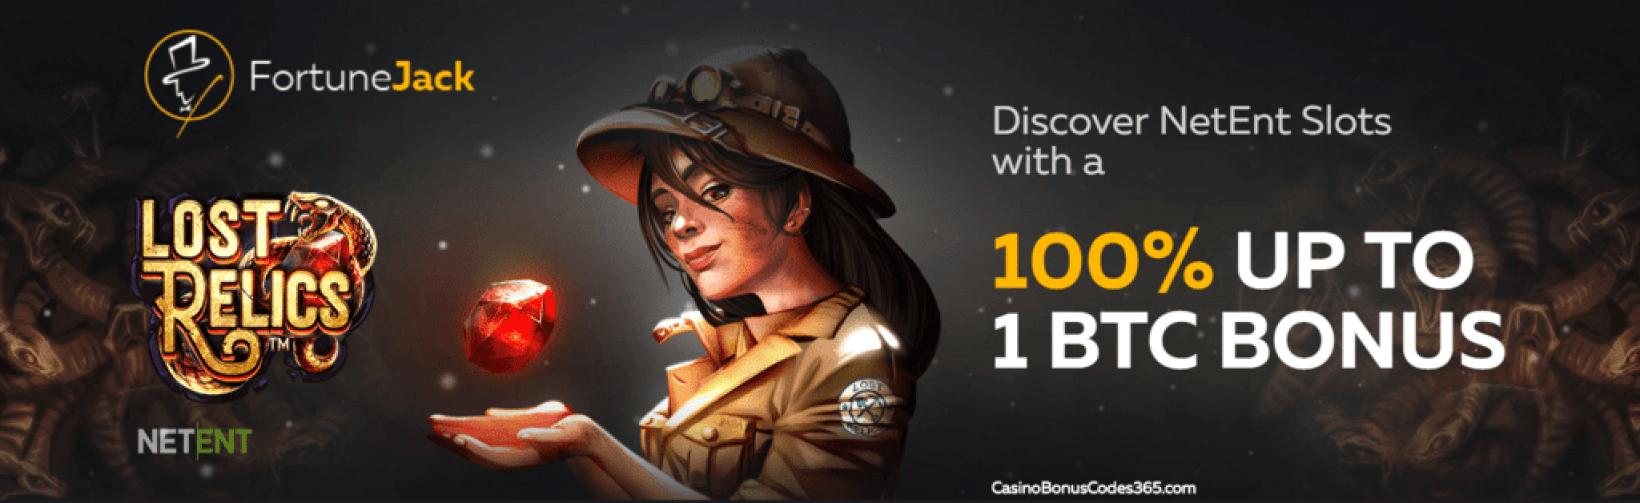 FortuneJack Casino NetEnt Games 100% Match Bonus up to 1BTC